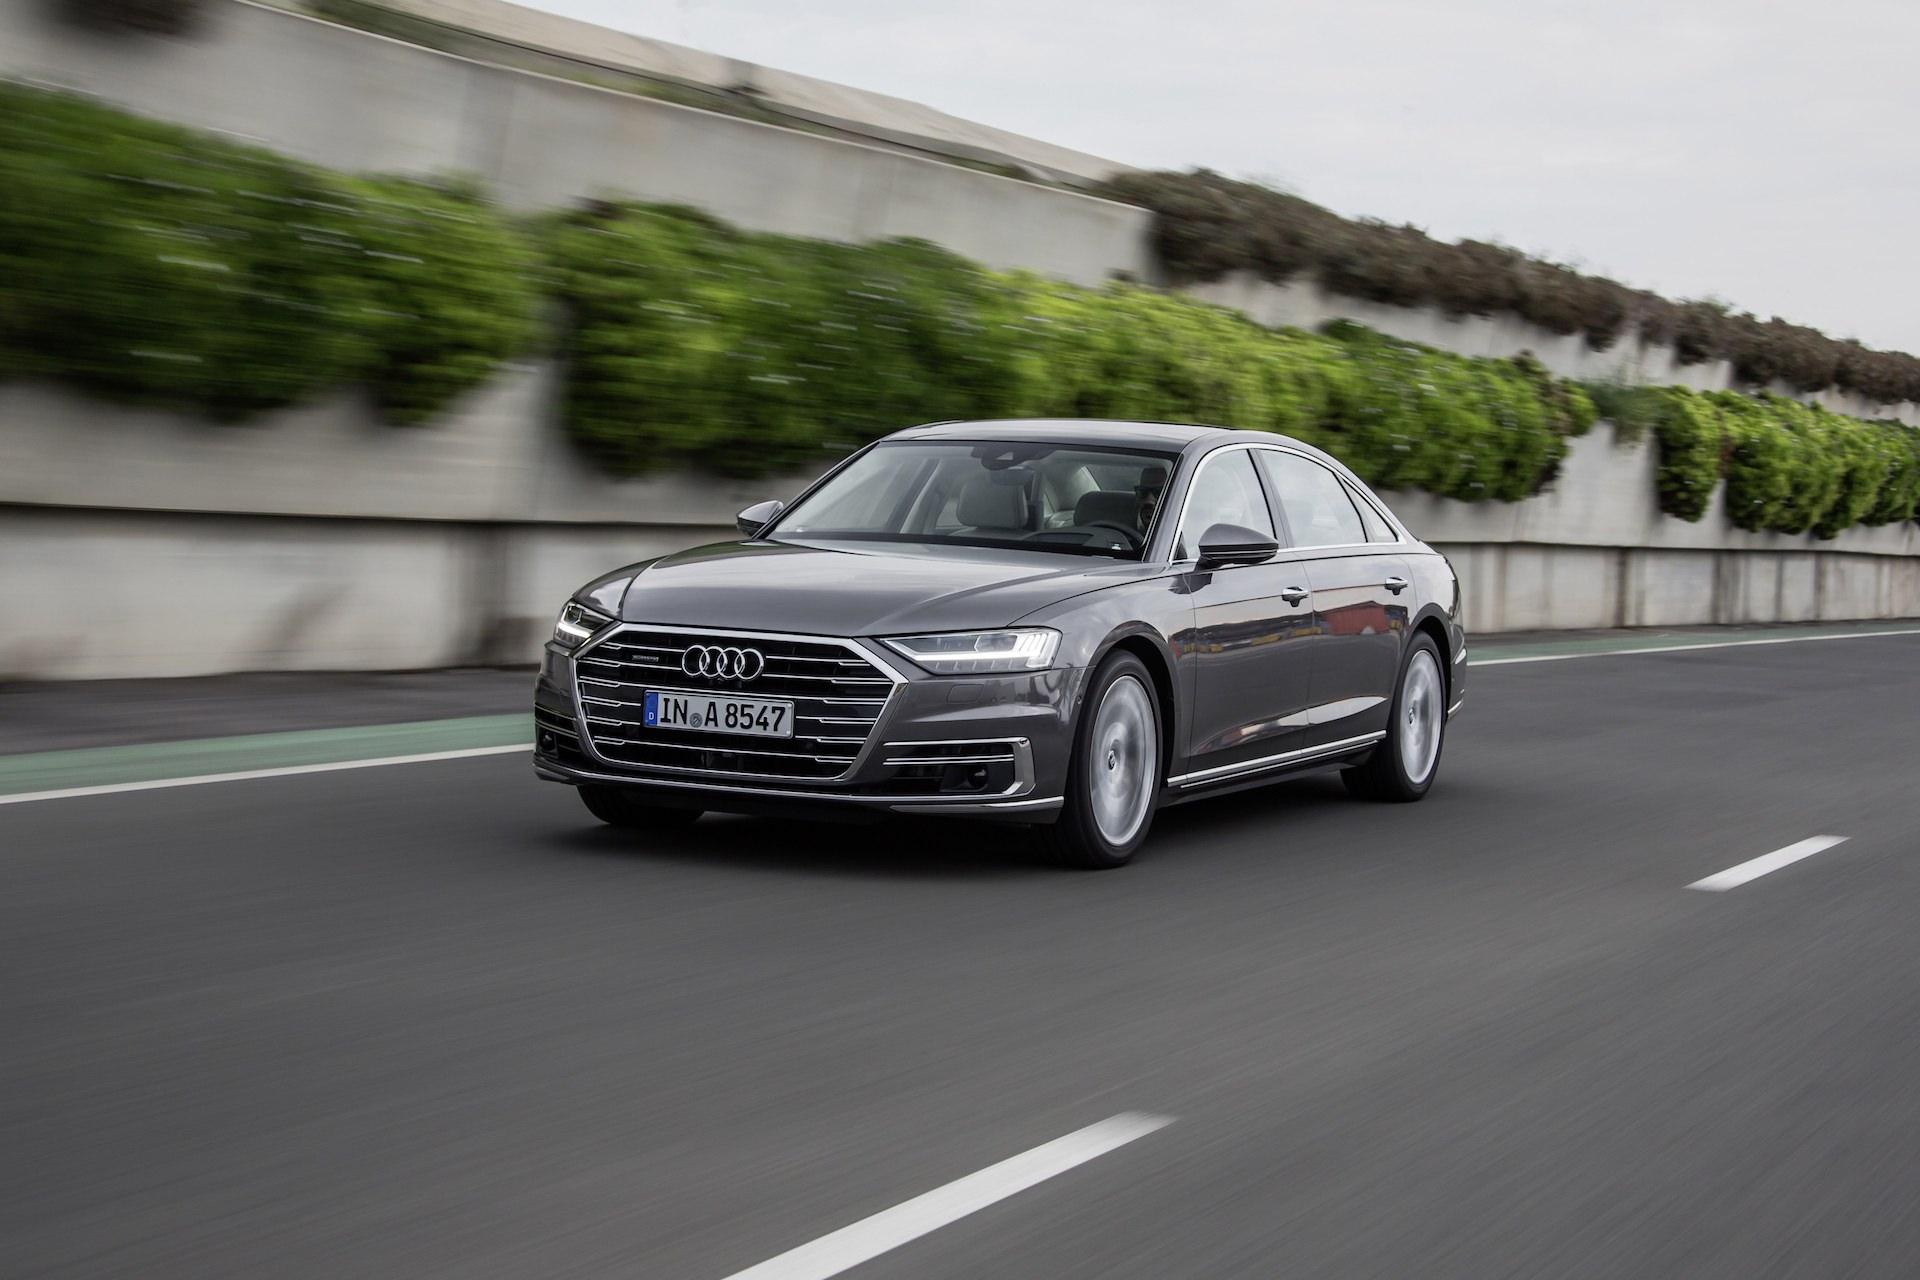 2019 Audi A8 preview